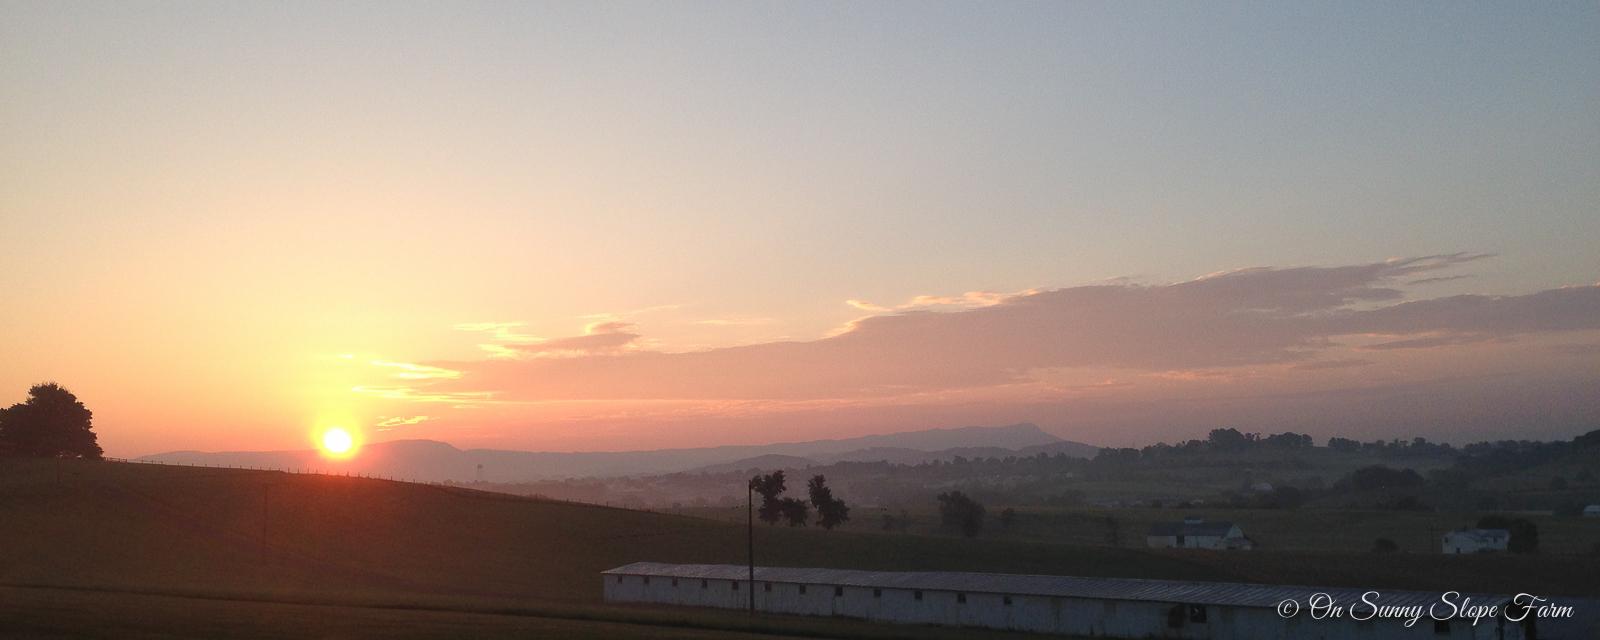 views-on-sunny-slope-farm-1-11